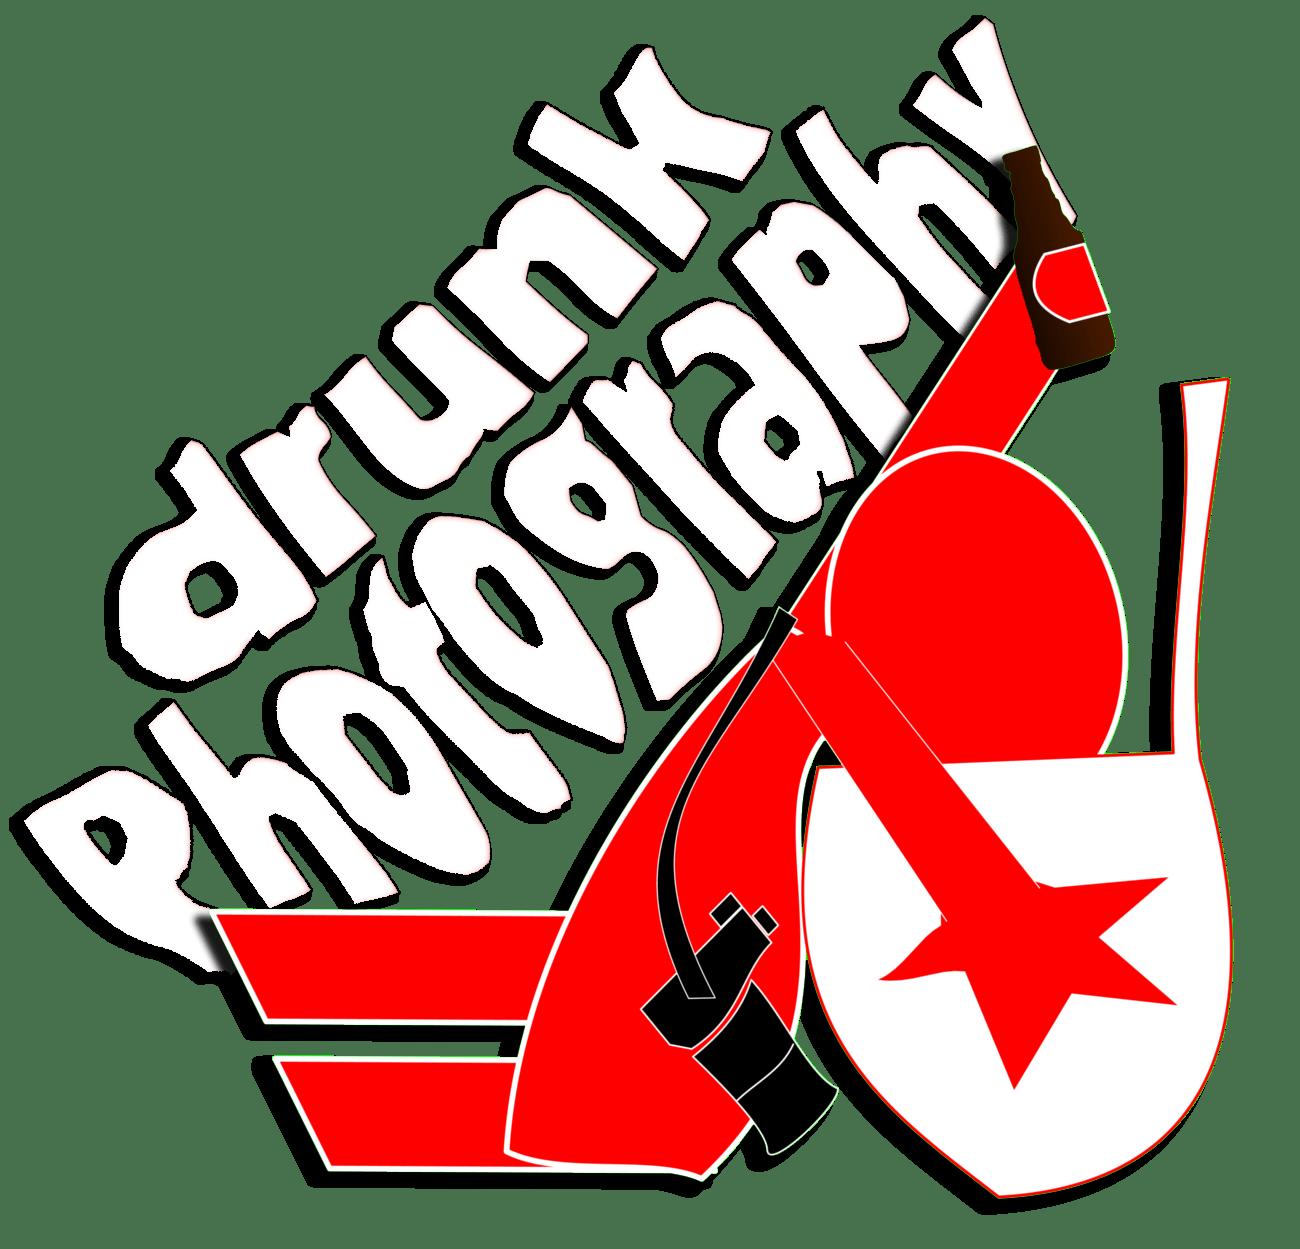 Drunkphotography.com Otis DuPont